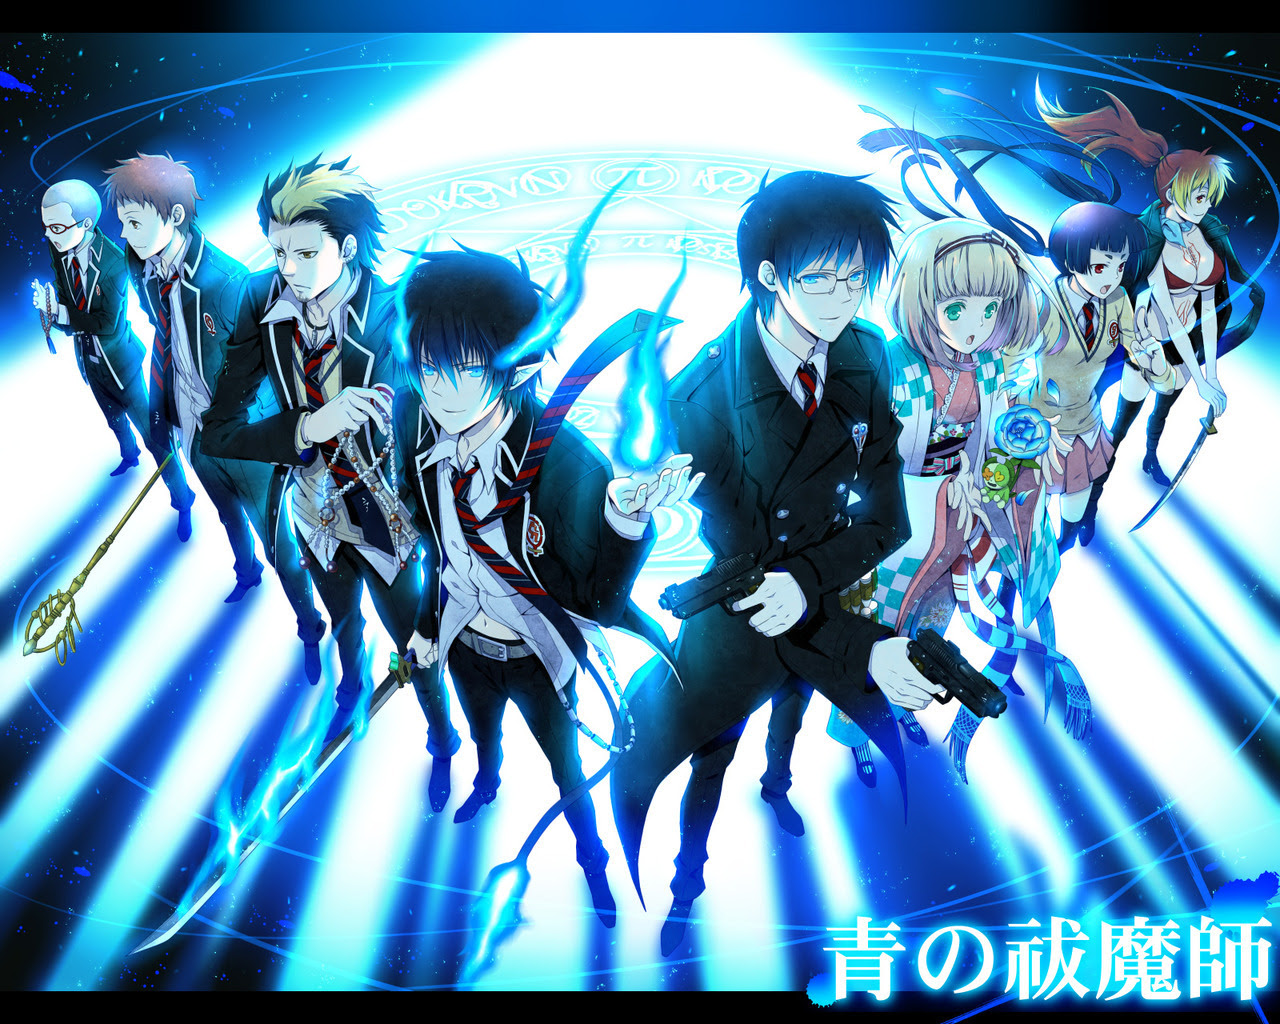 http://24.media.tumblr.com/tumblr_m8m1z9O1Wl1rdz9cno1_1280.jpg